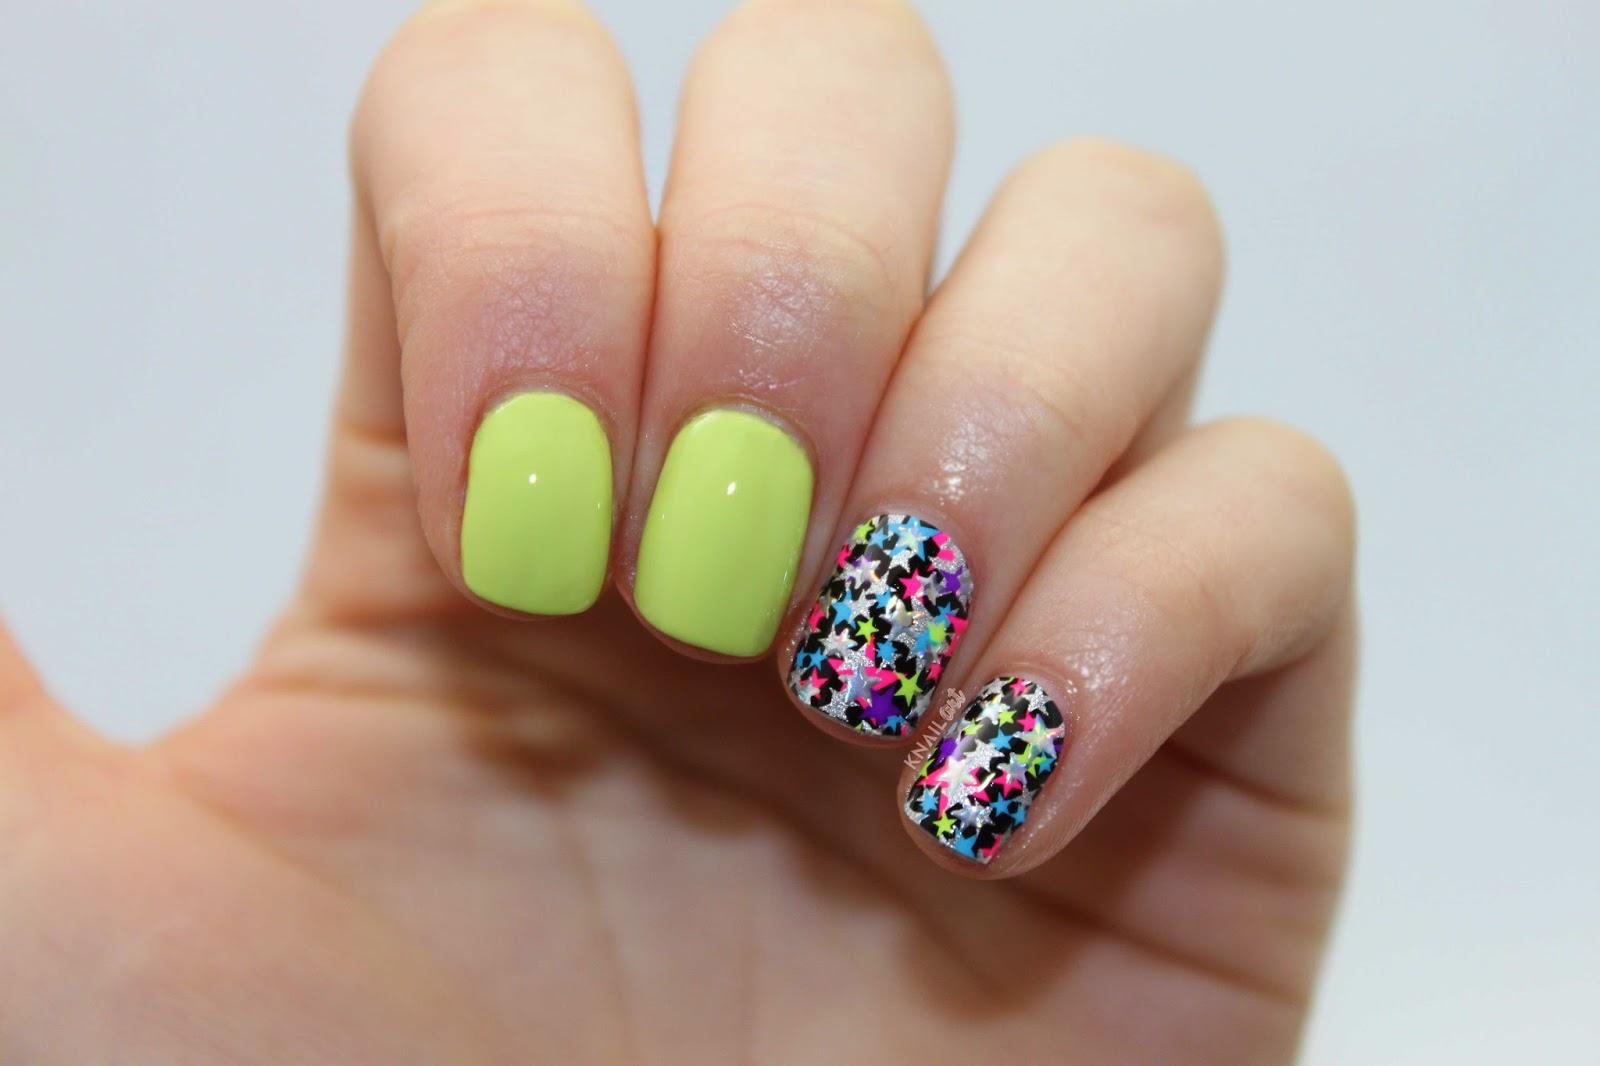 knailart: NOTD: Kiss Neon Star Nail Strips + O.P.I. Life Gave Me Lemons